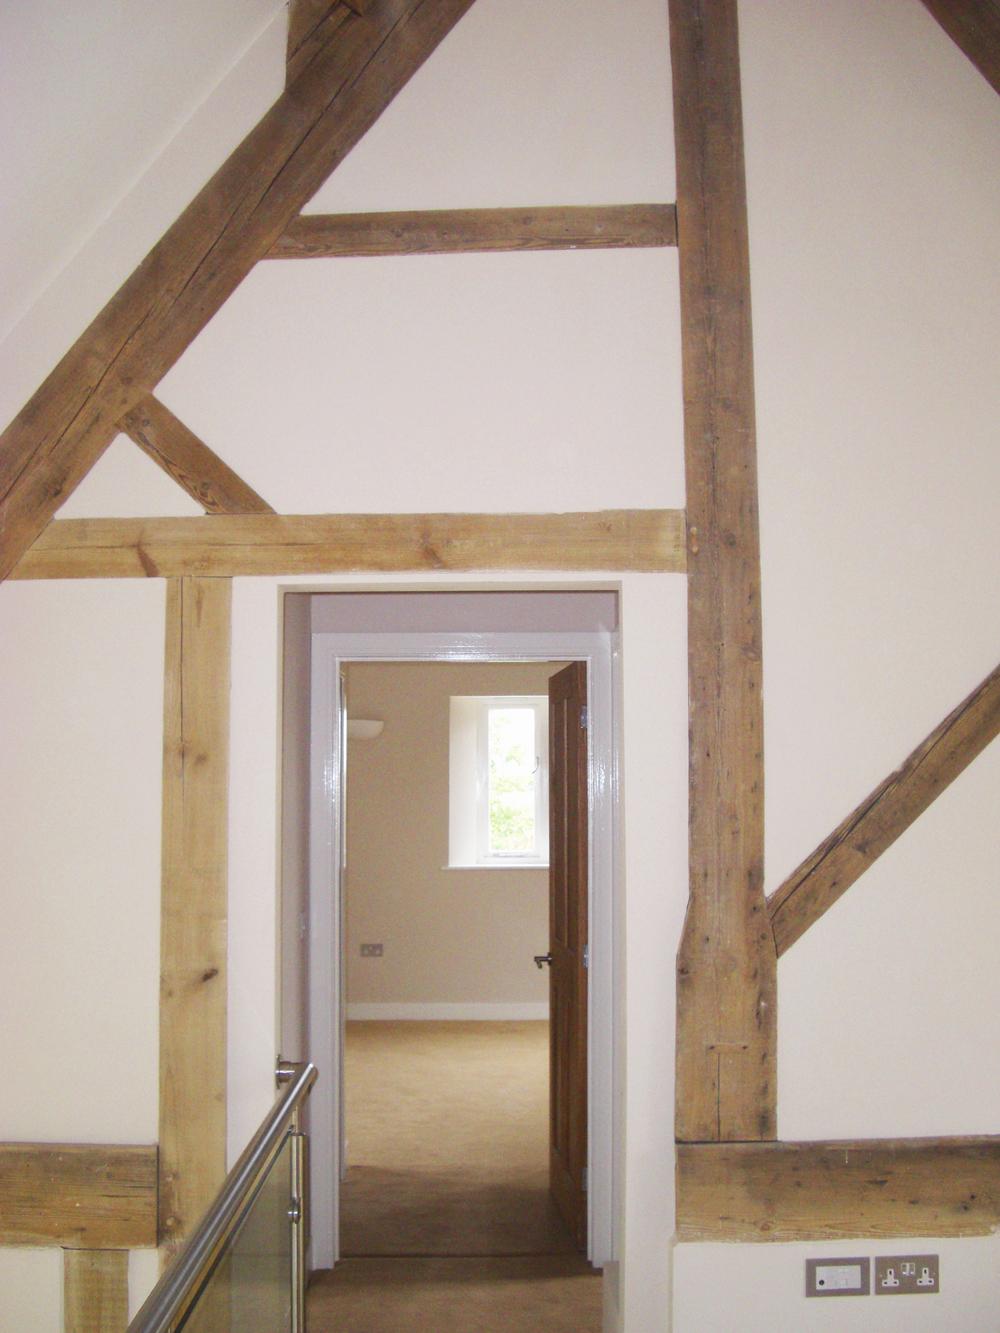 Reconfigured king post truss